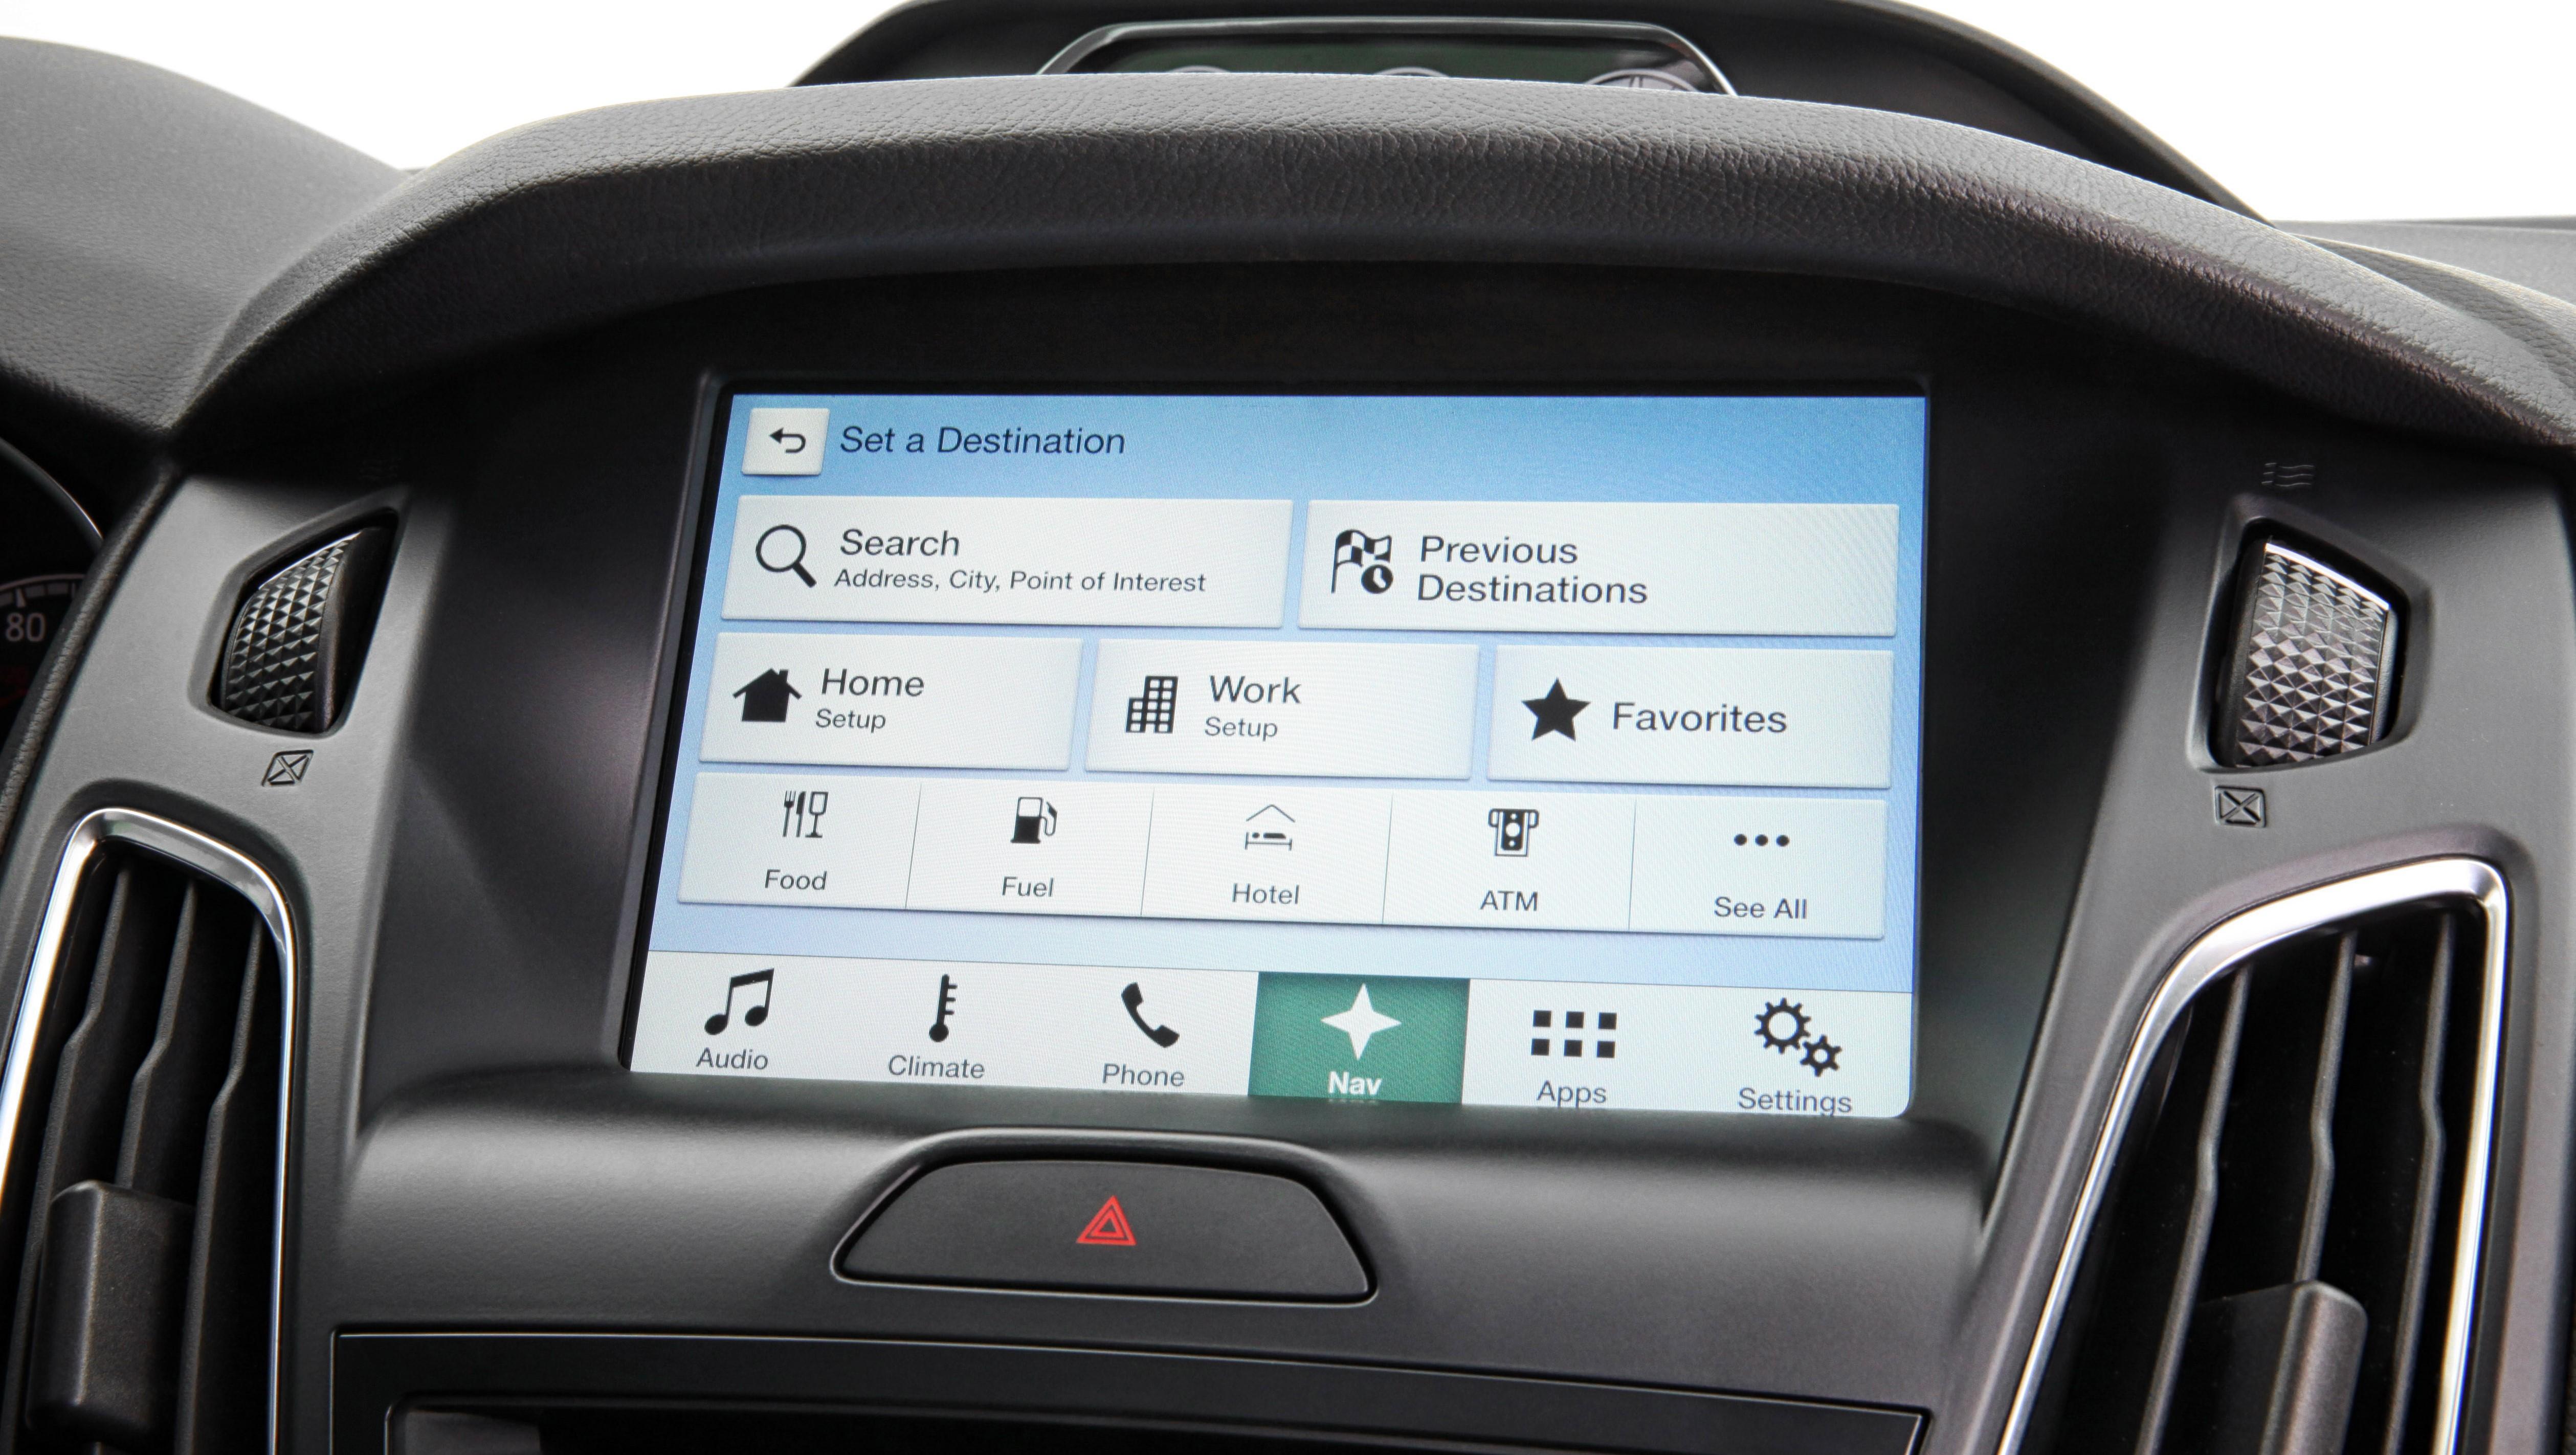 All the best car tech we've seen in 2015 | T3